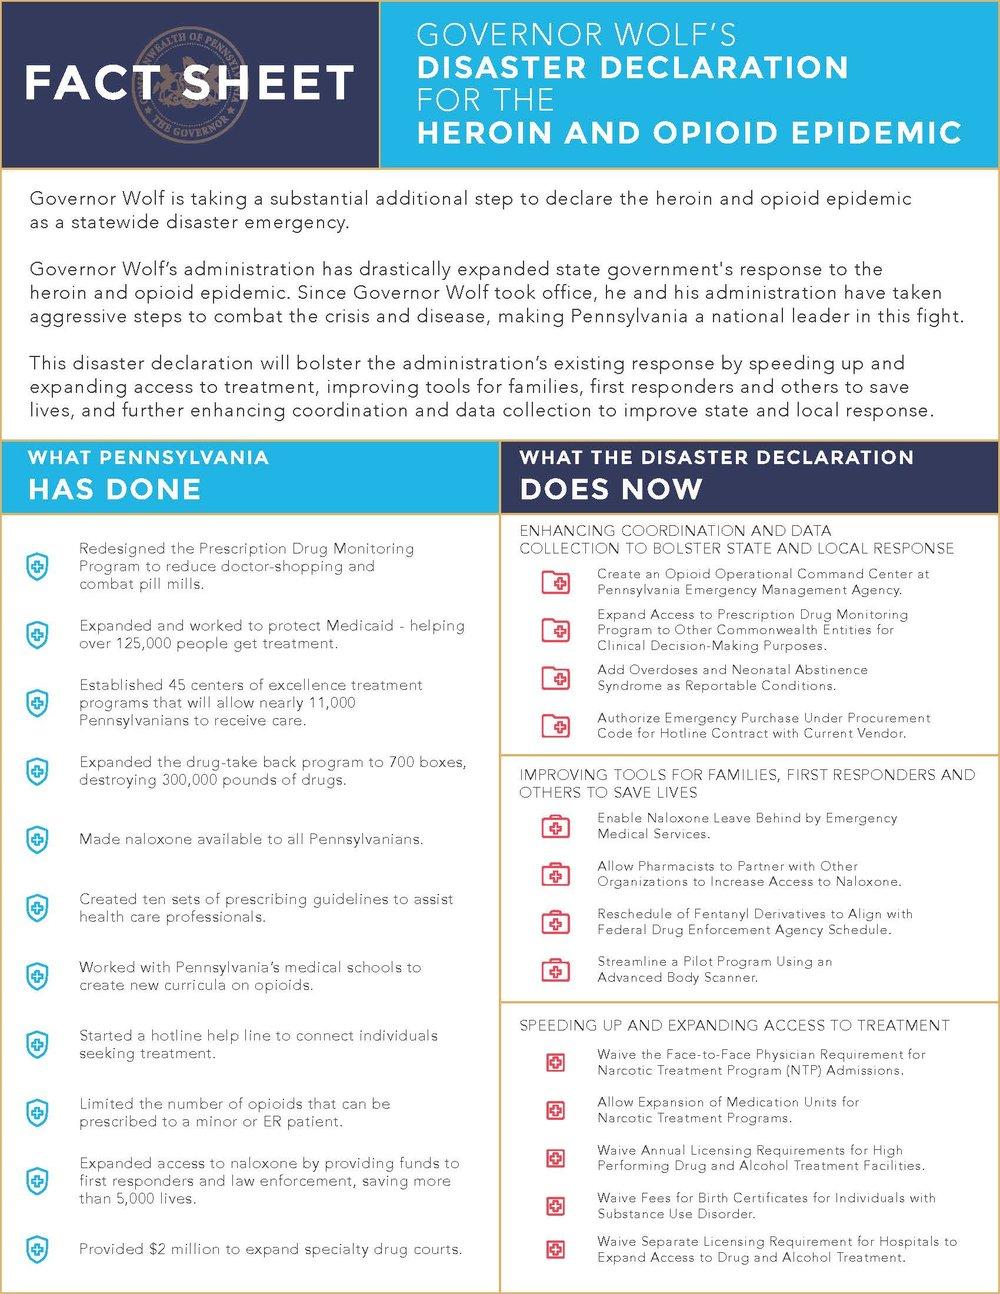 Opioid Epidemic Disaster Declaration